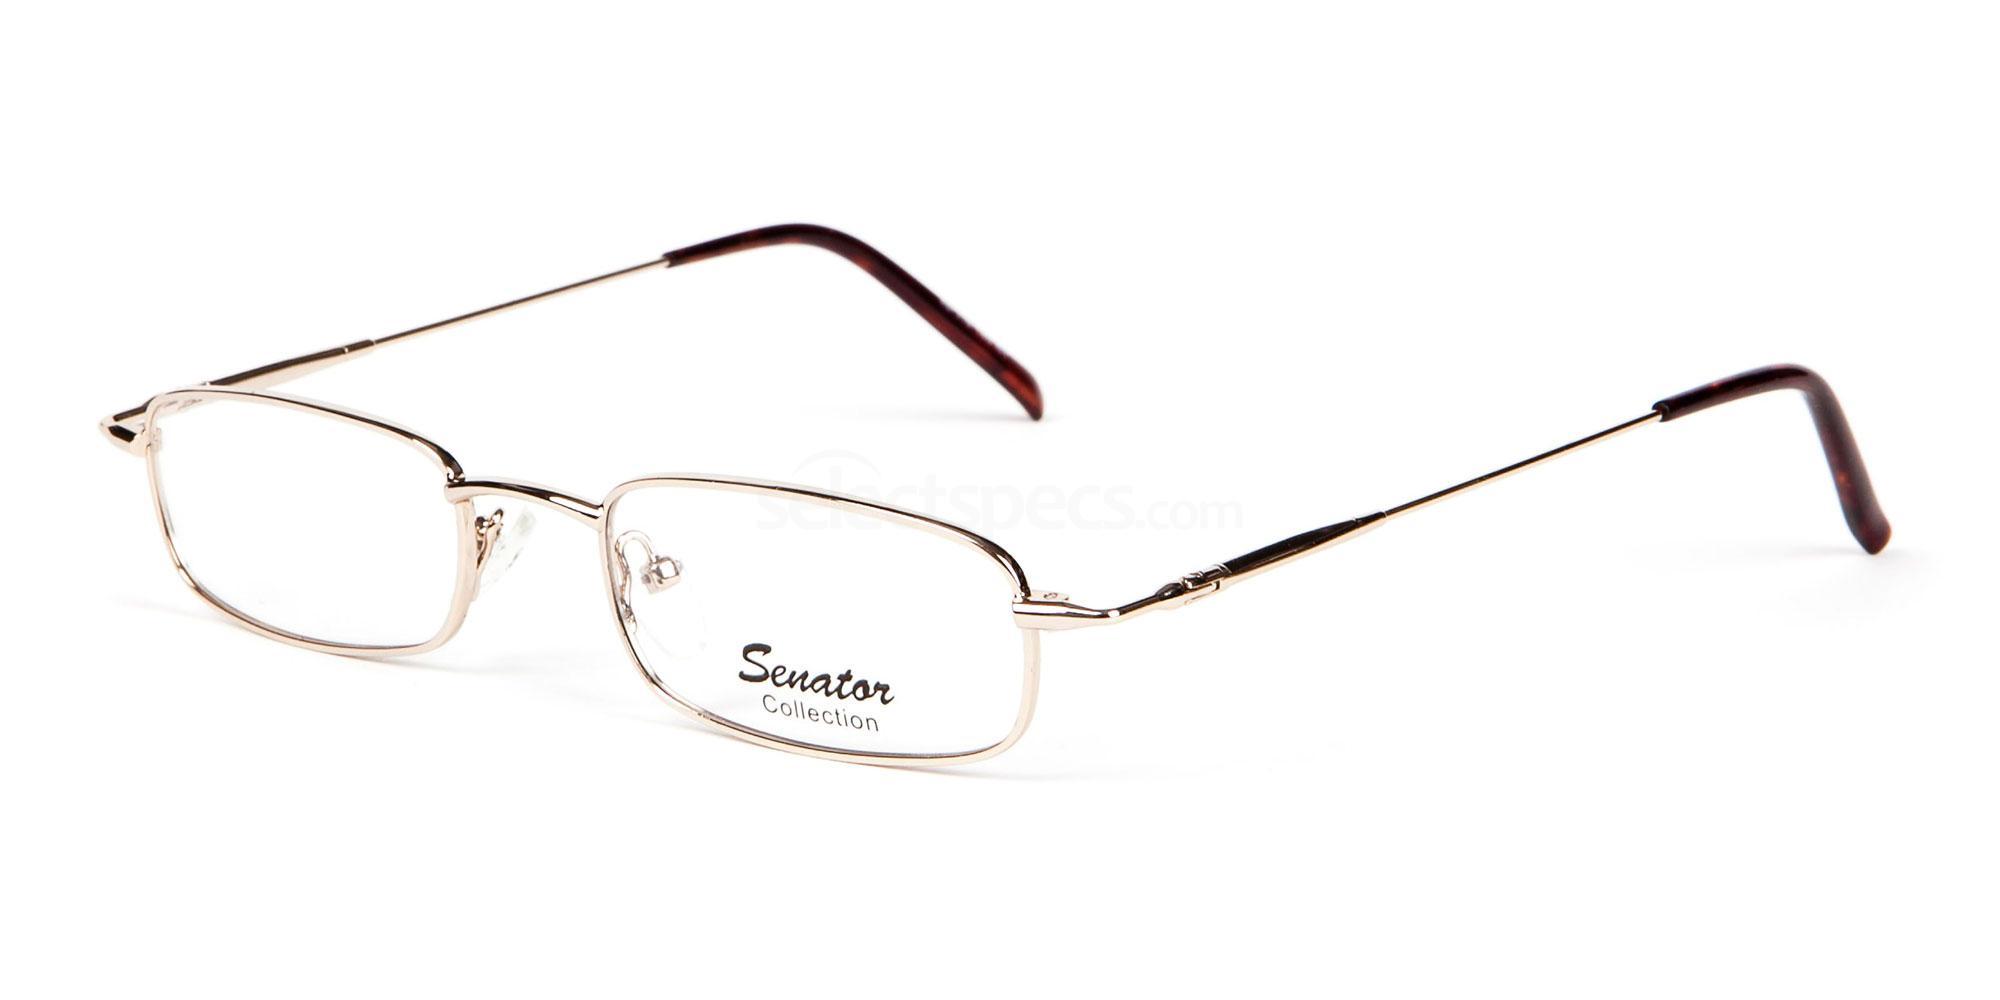 C1 SENATOR C141 Glasses, Senator